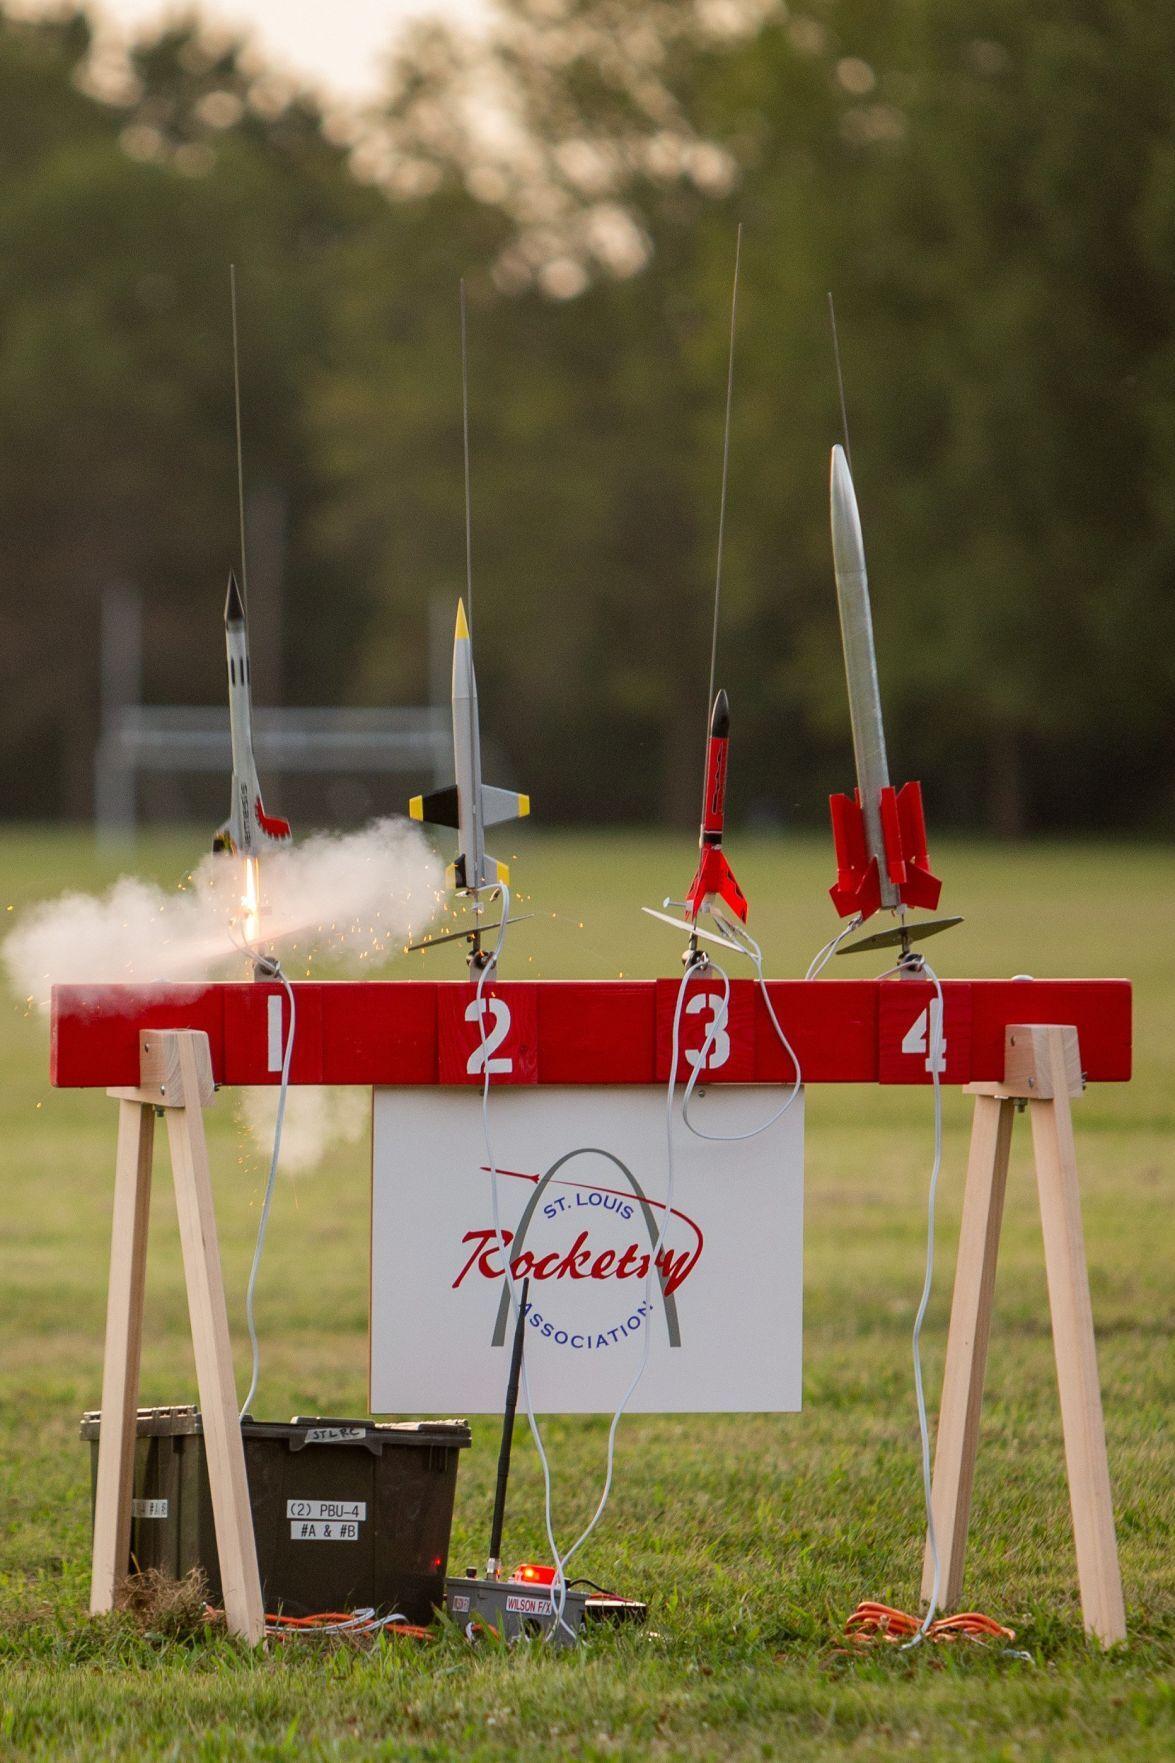 St. Louis Rocketry Association first night launch